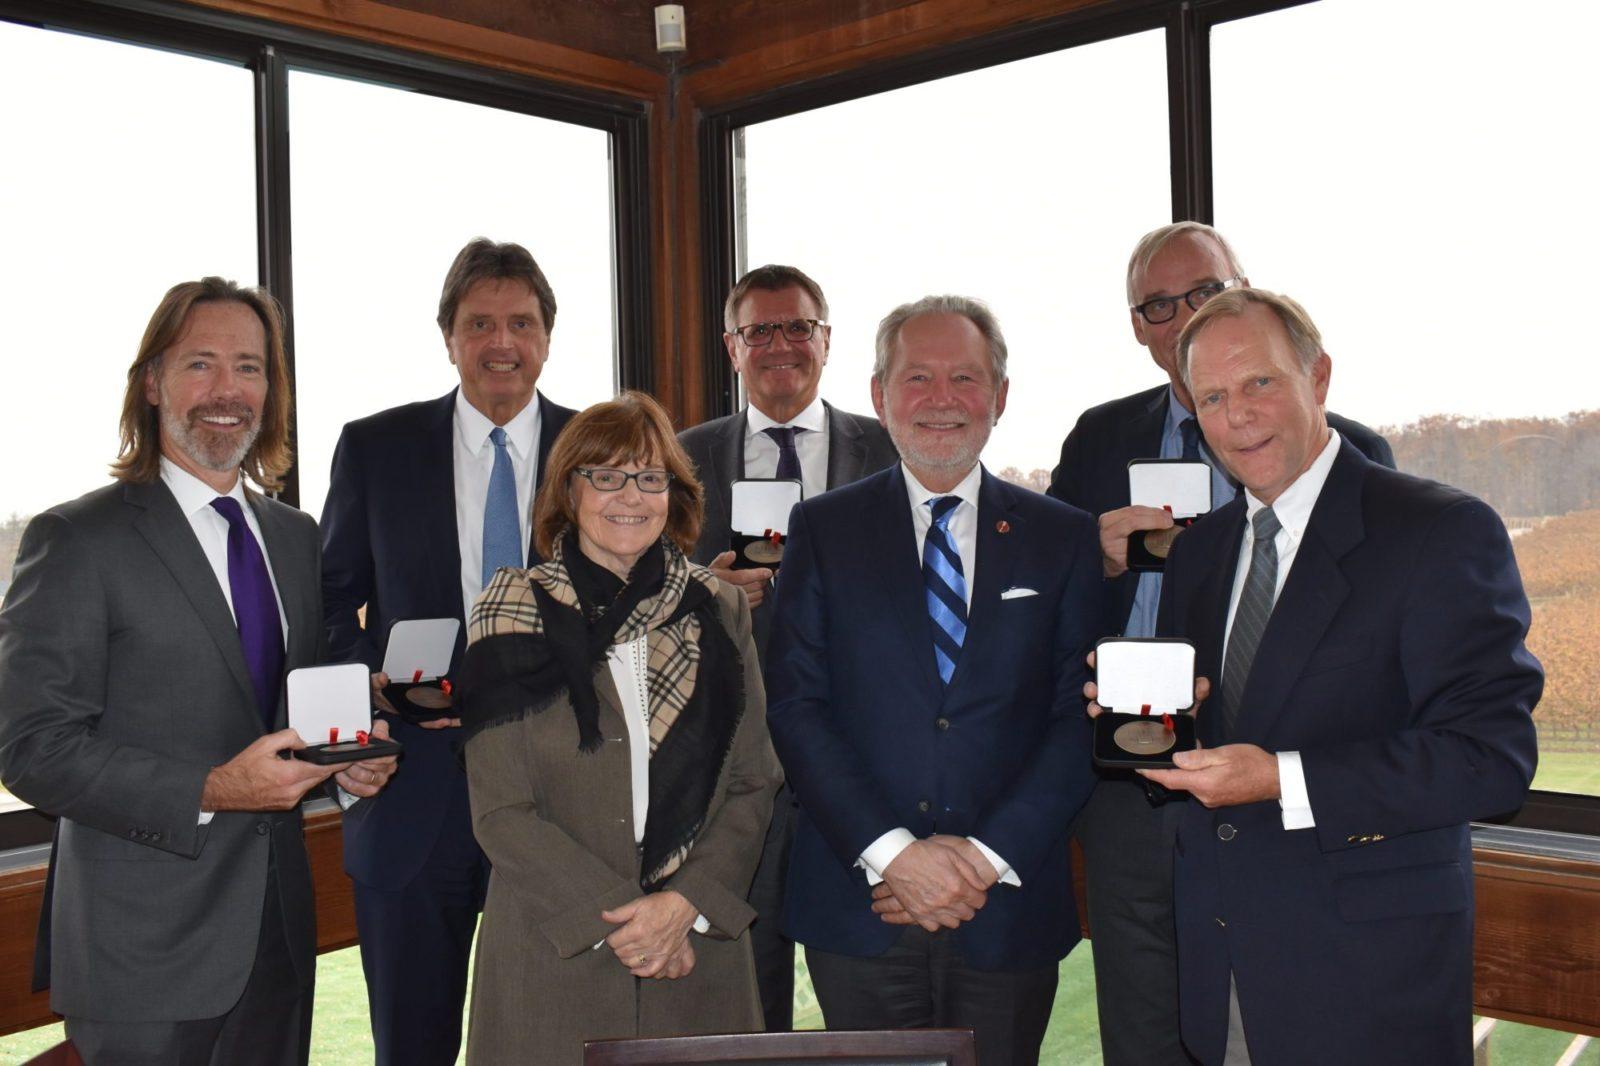 Senator Harder awards exceptional citizens in Niagara Region